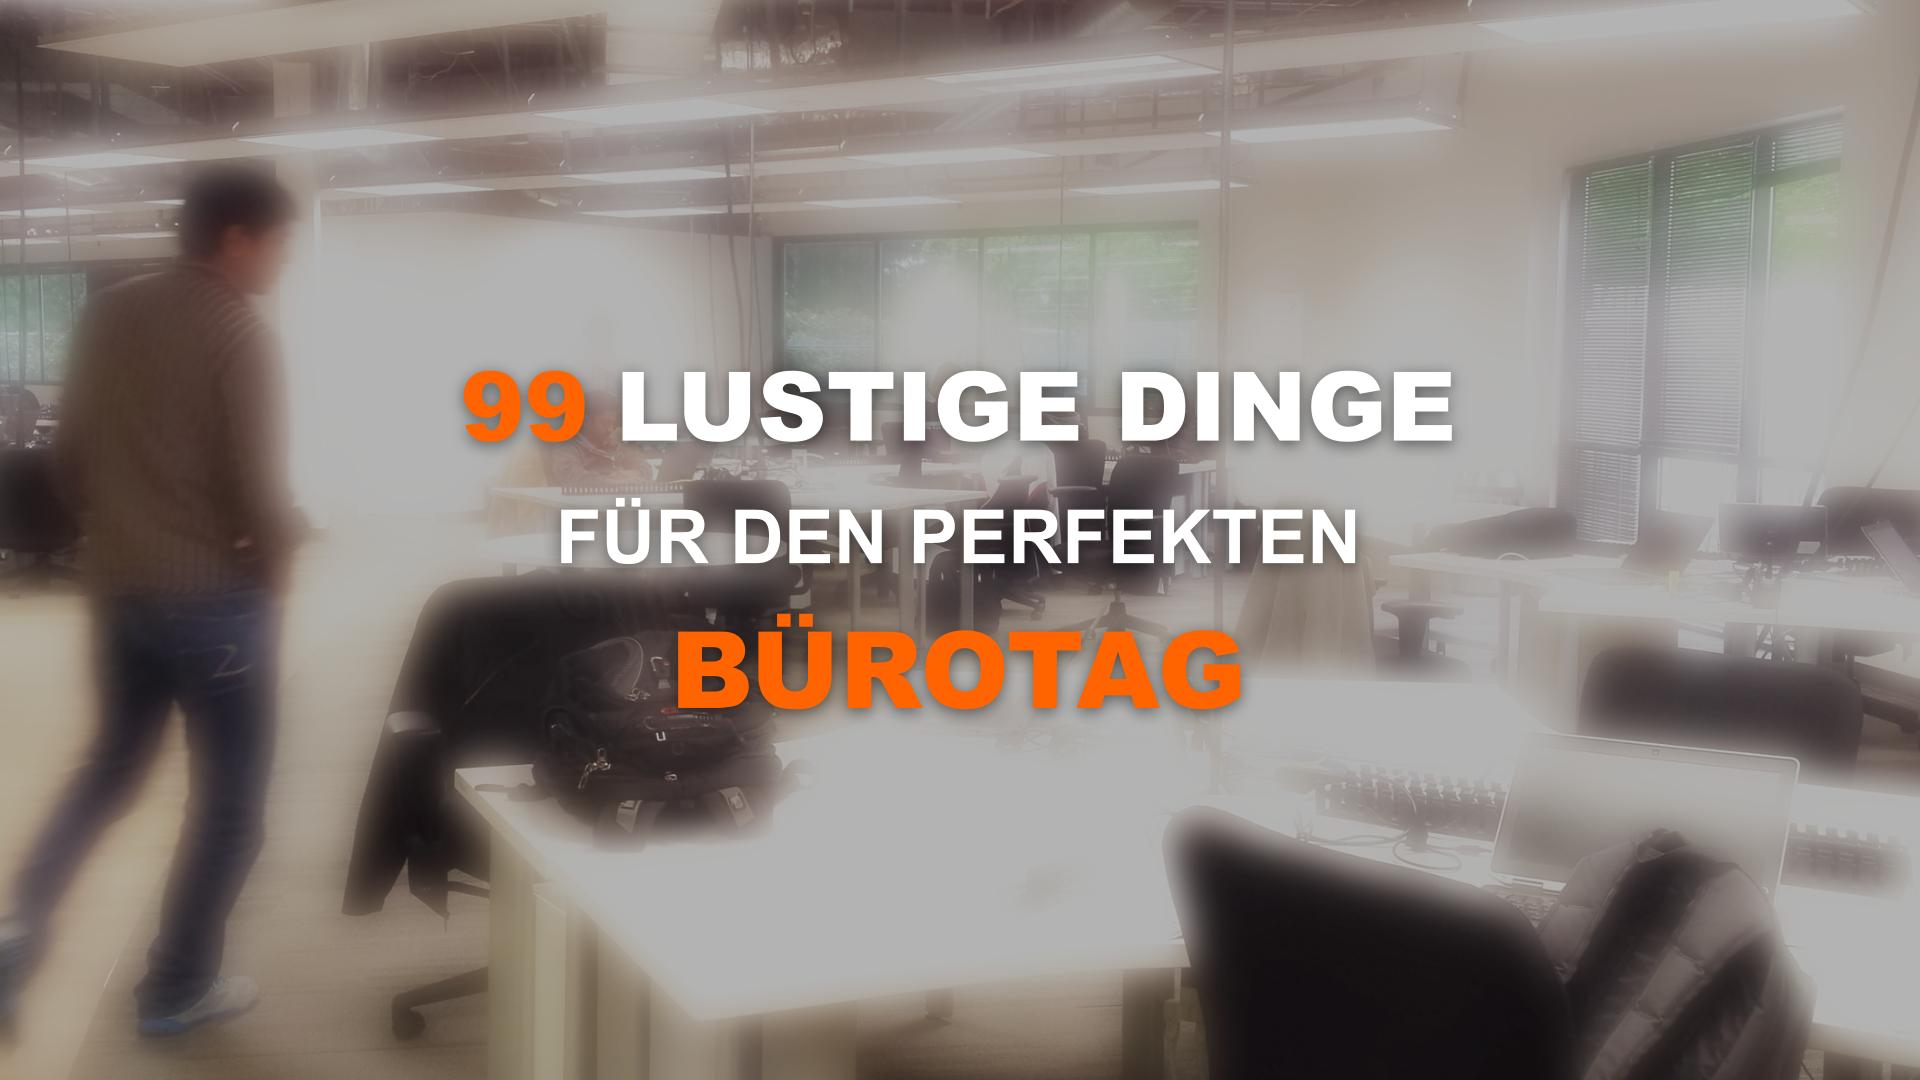 99 lustige Dinge für den perfekten Bürotag